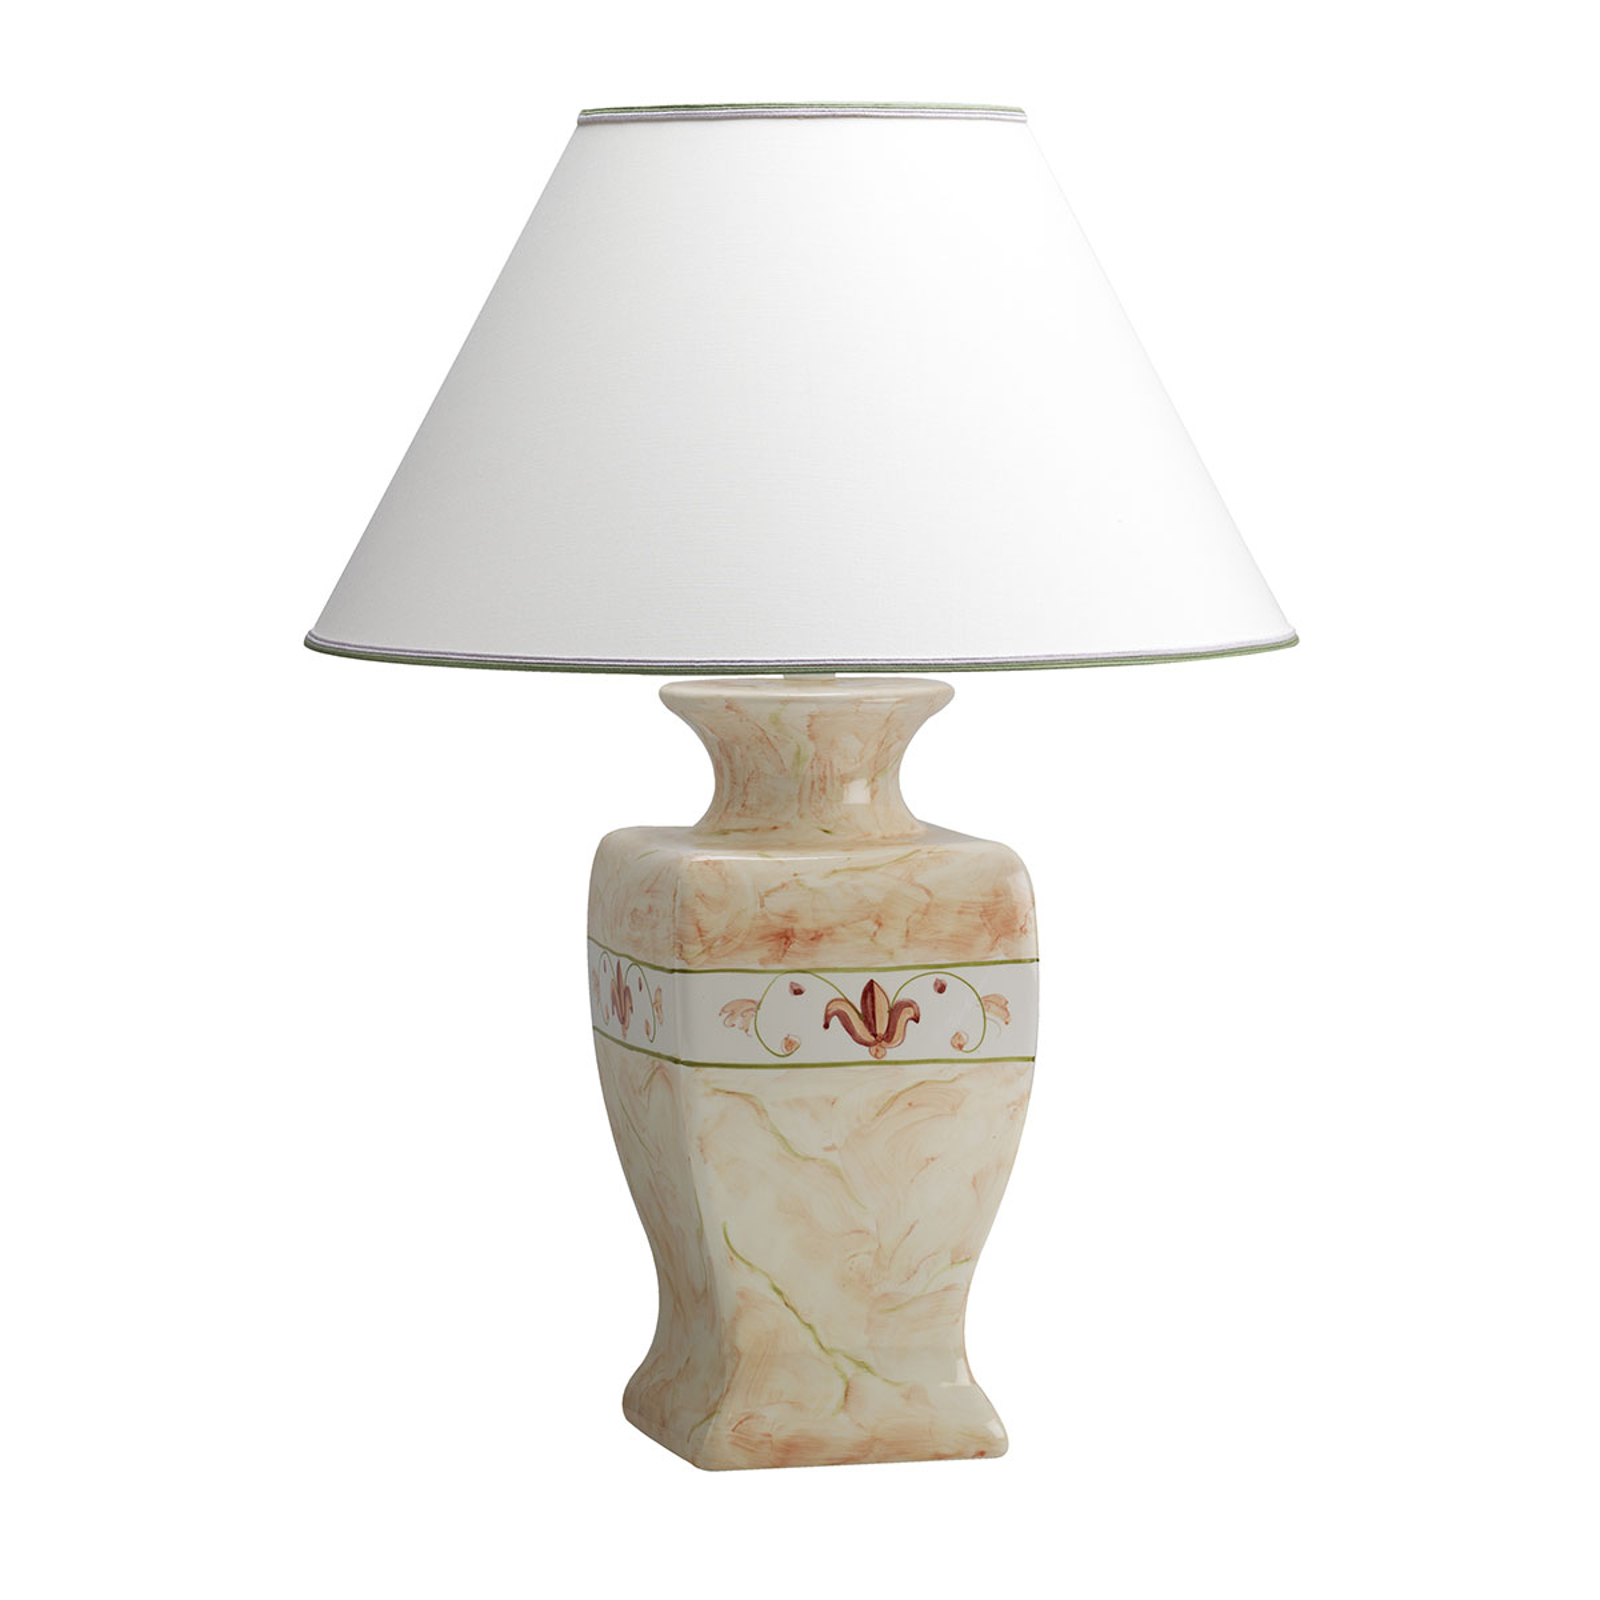 Keramikpallampa Marmorino - höjd 70 cm